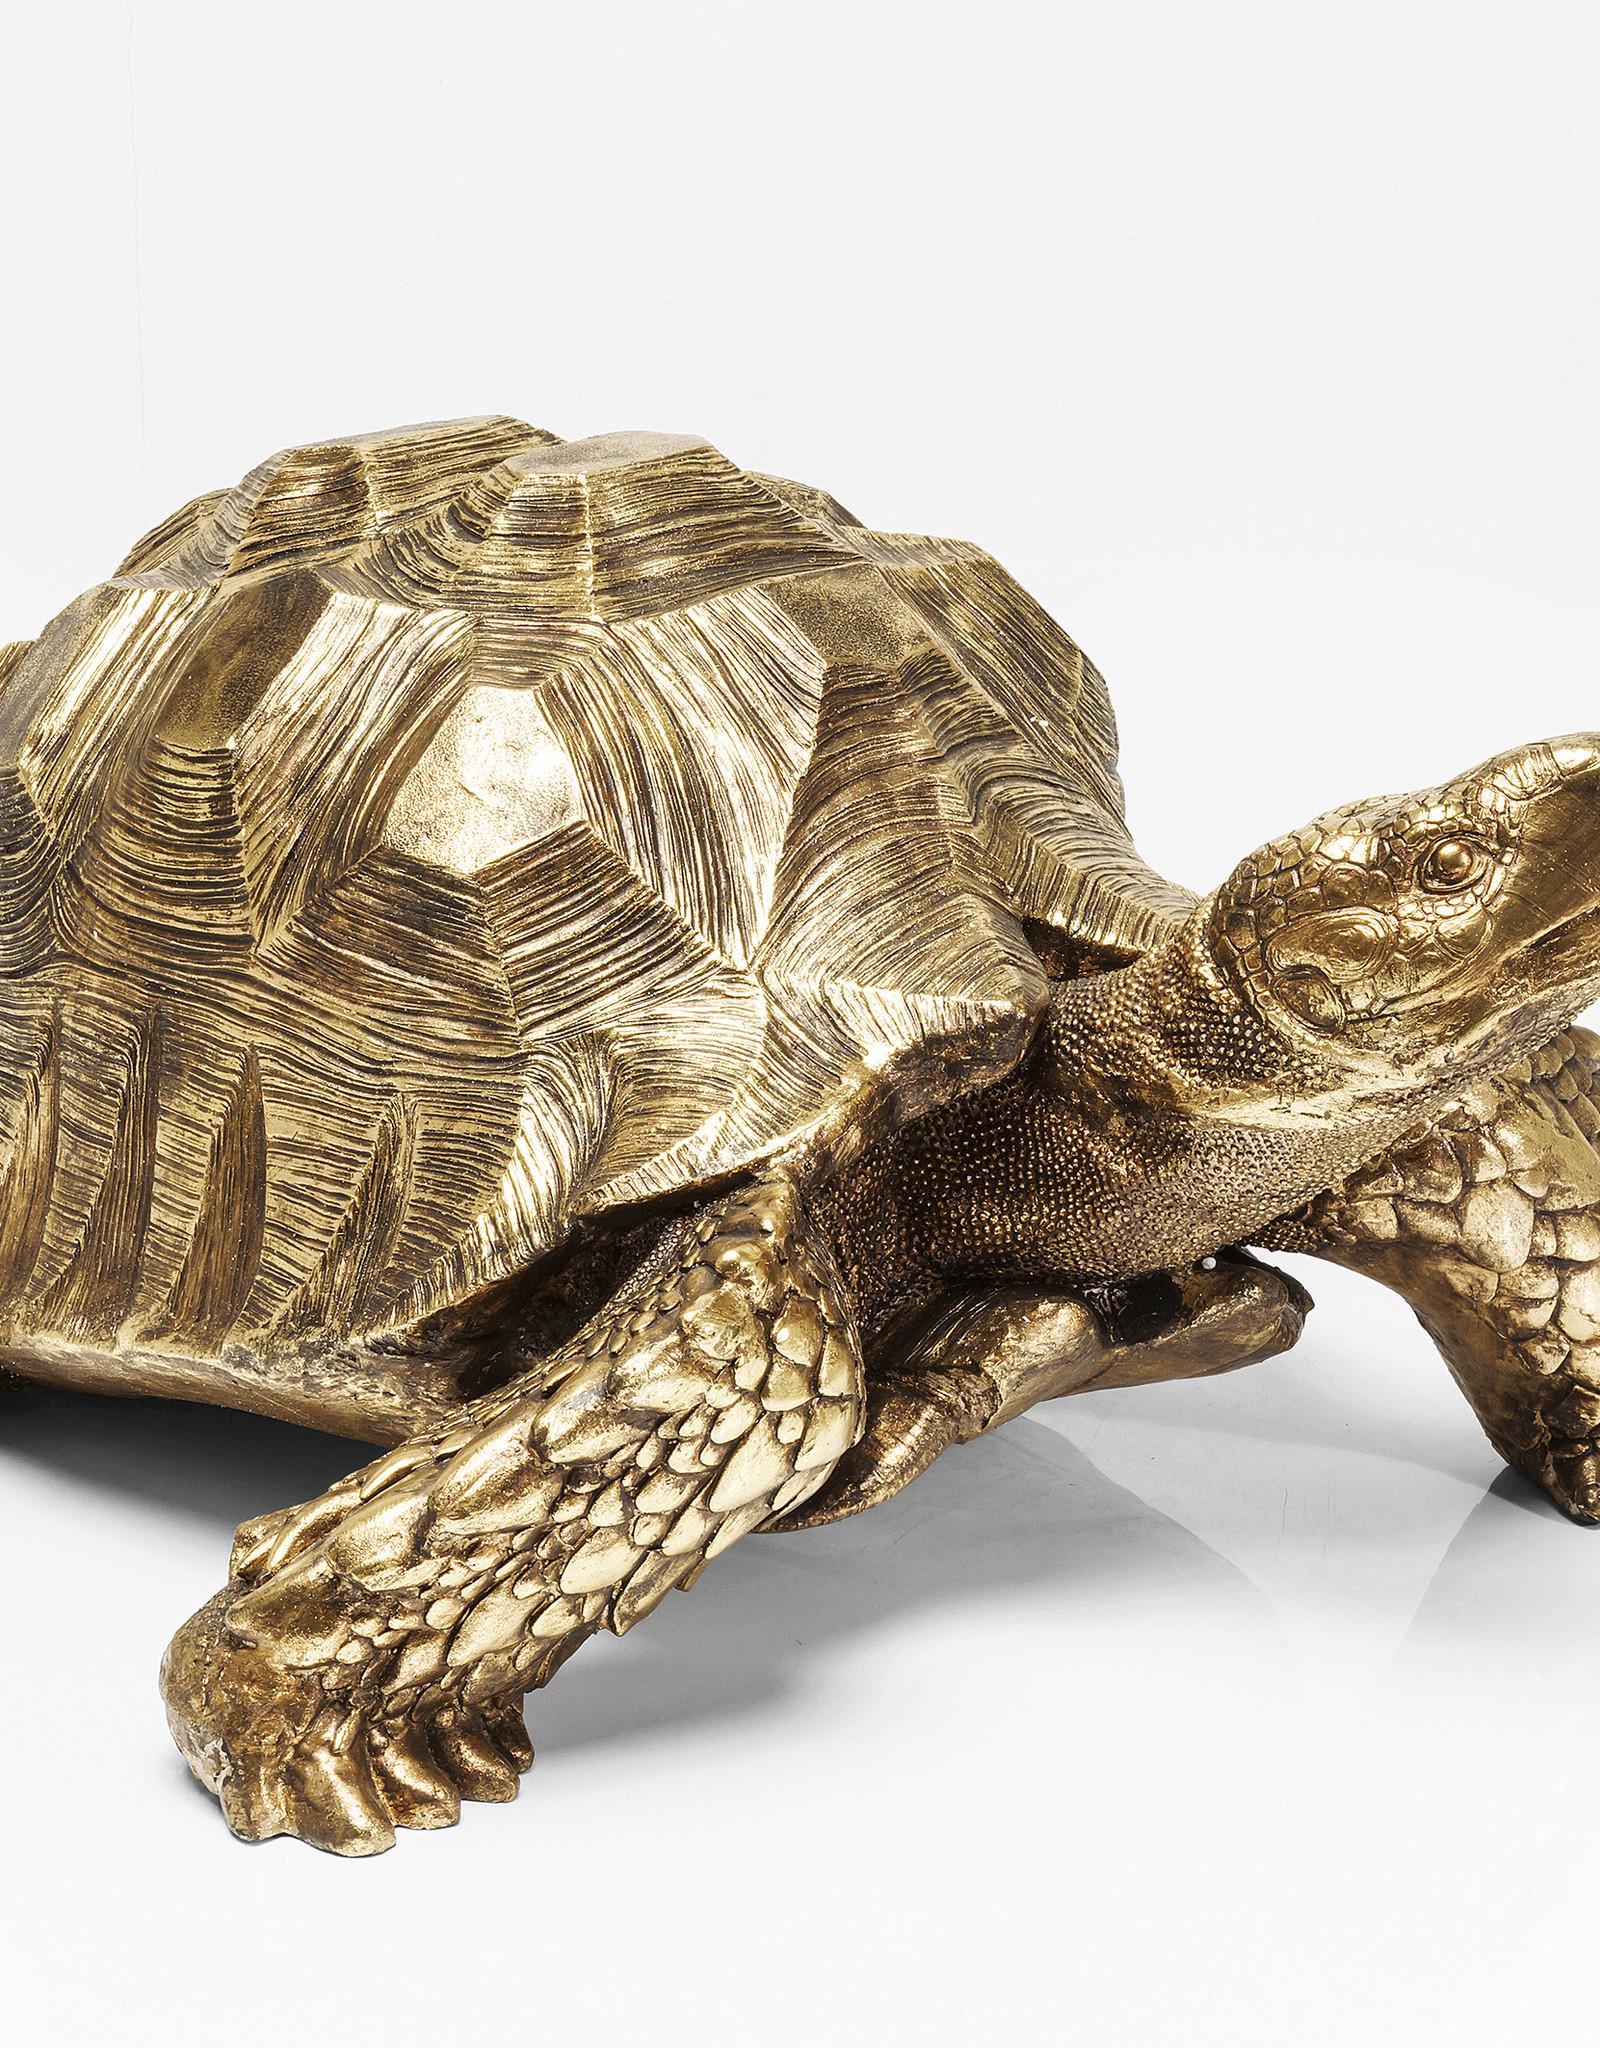 KARE DESIGN Deco Figurine Turtle Gold Big